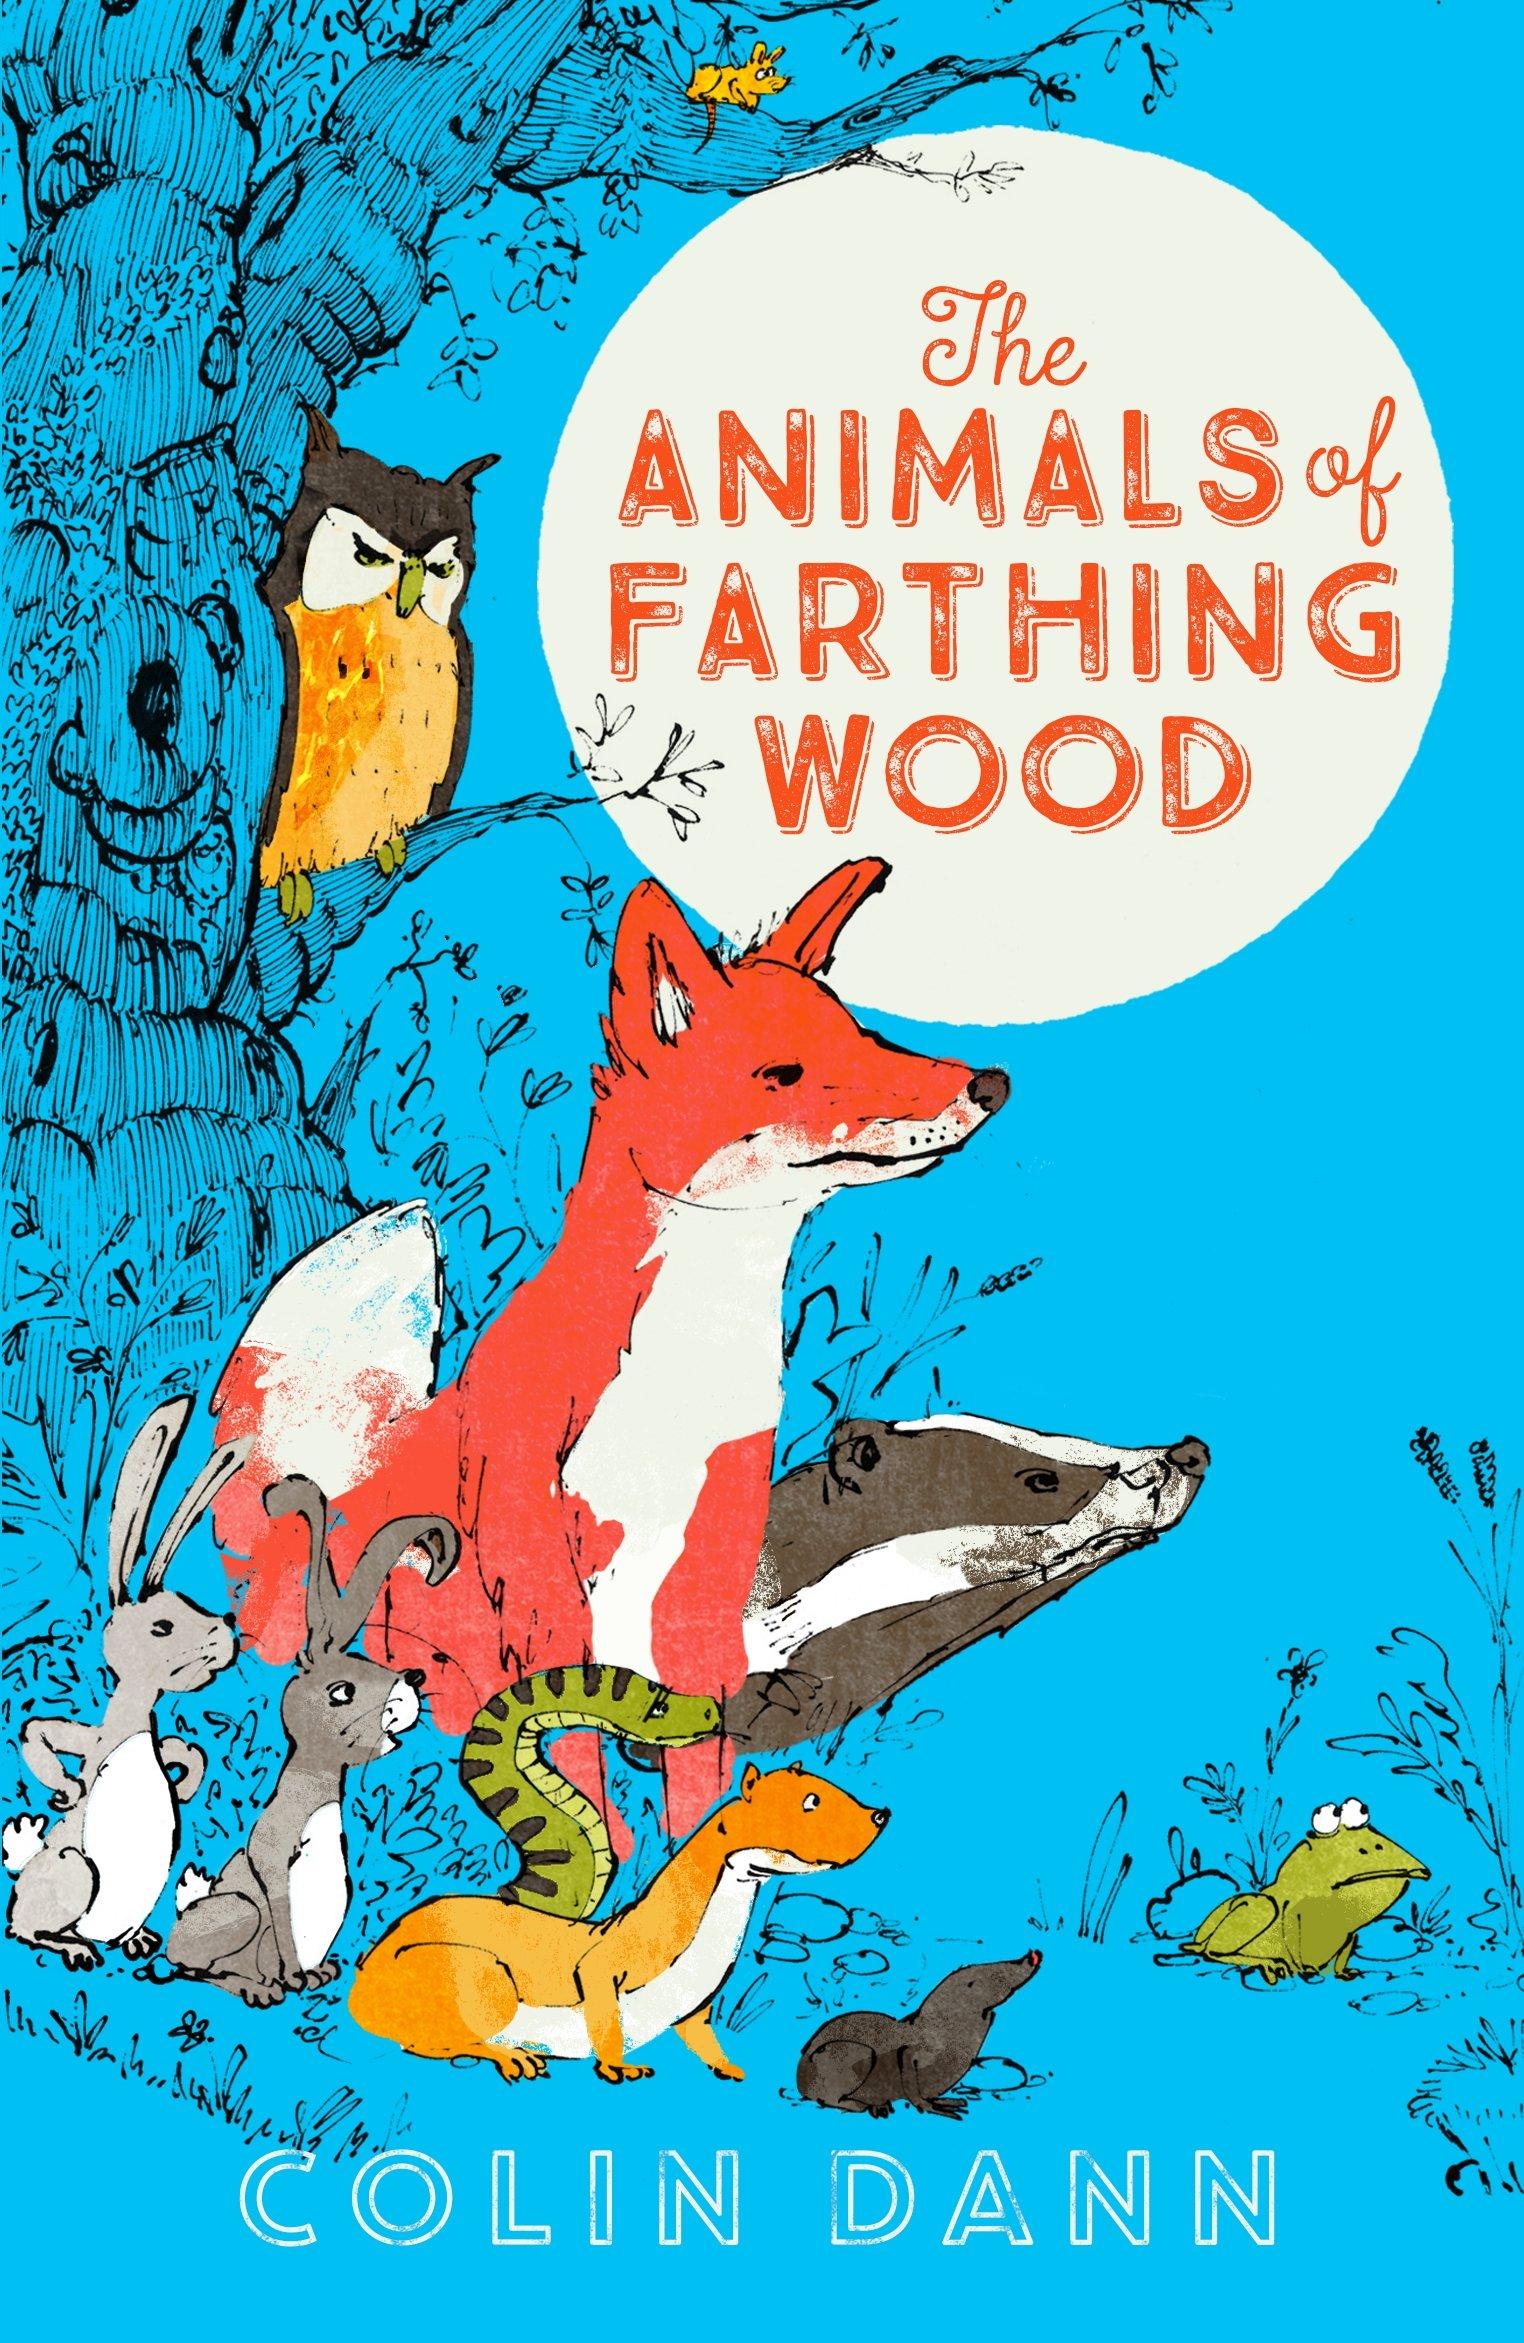 The Animals of Farthing Wood (Egmont Modern Classics)